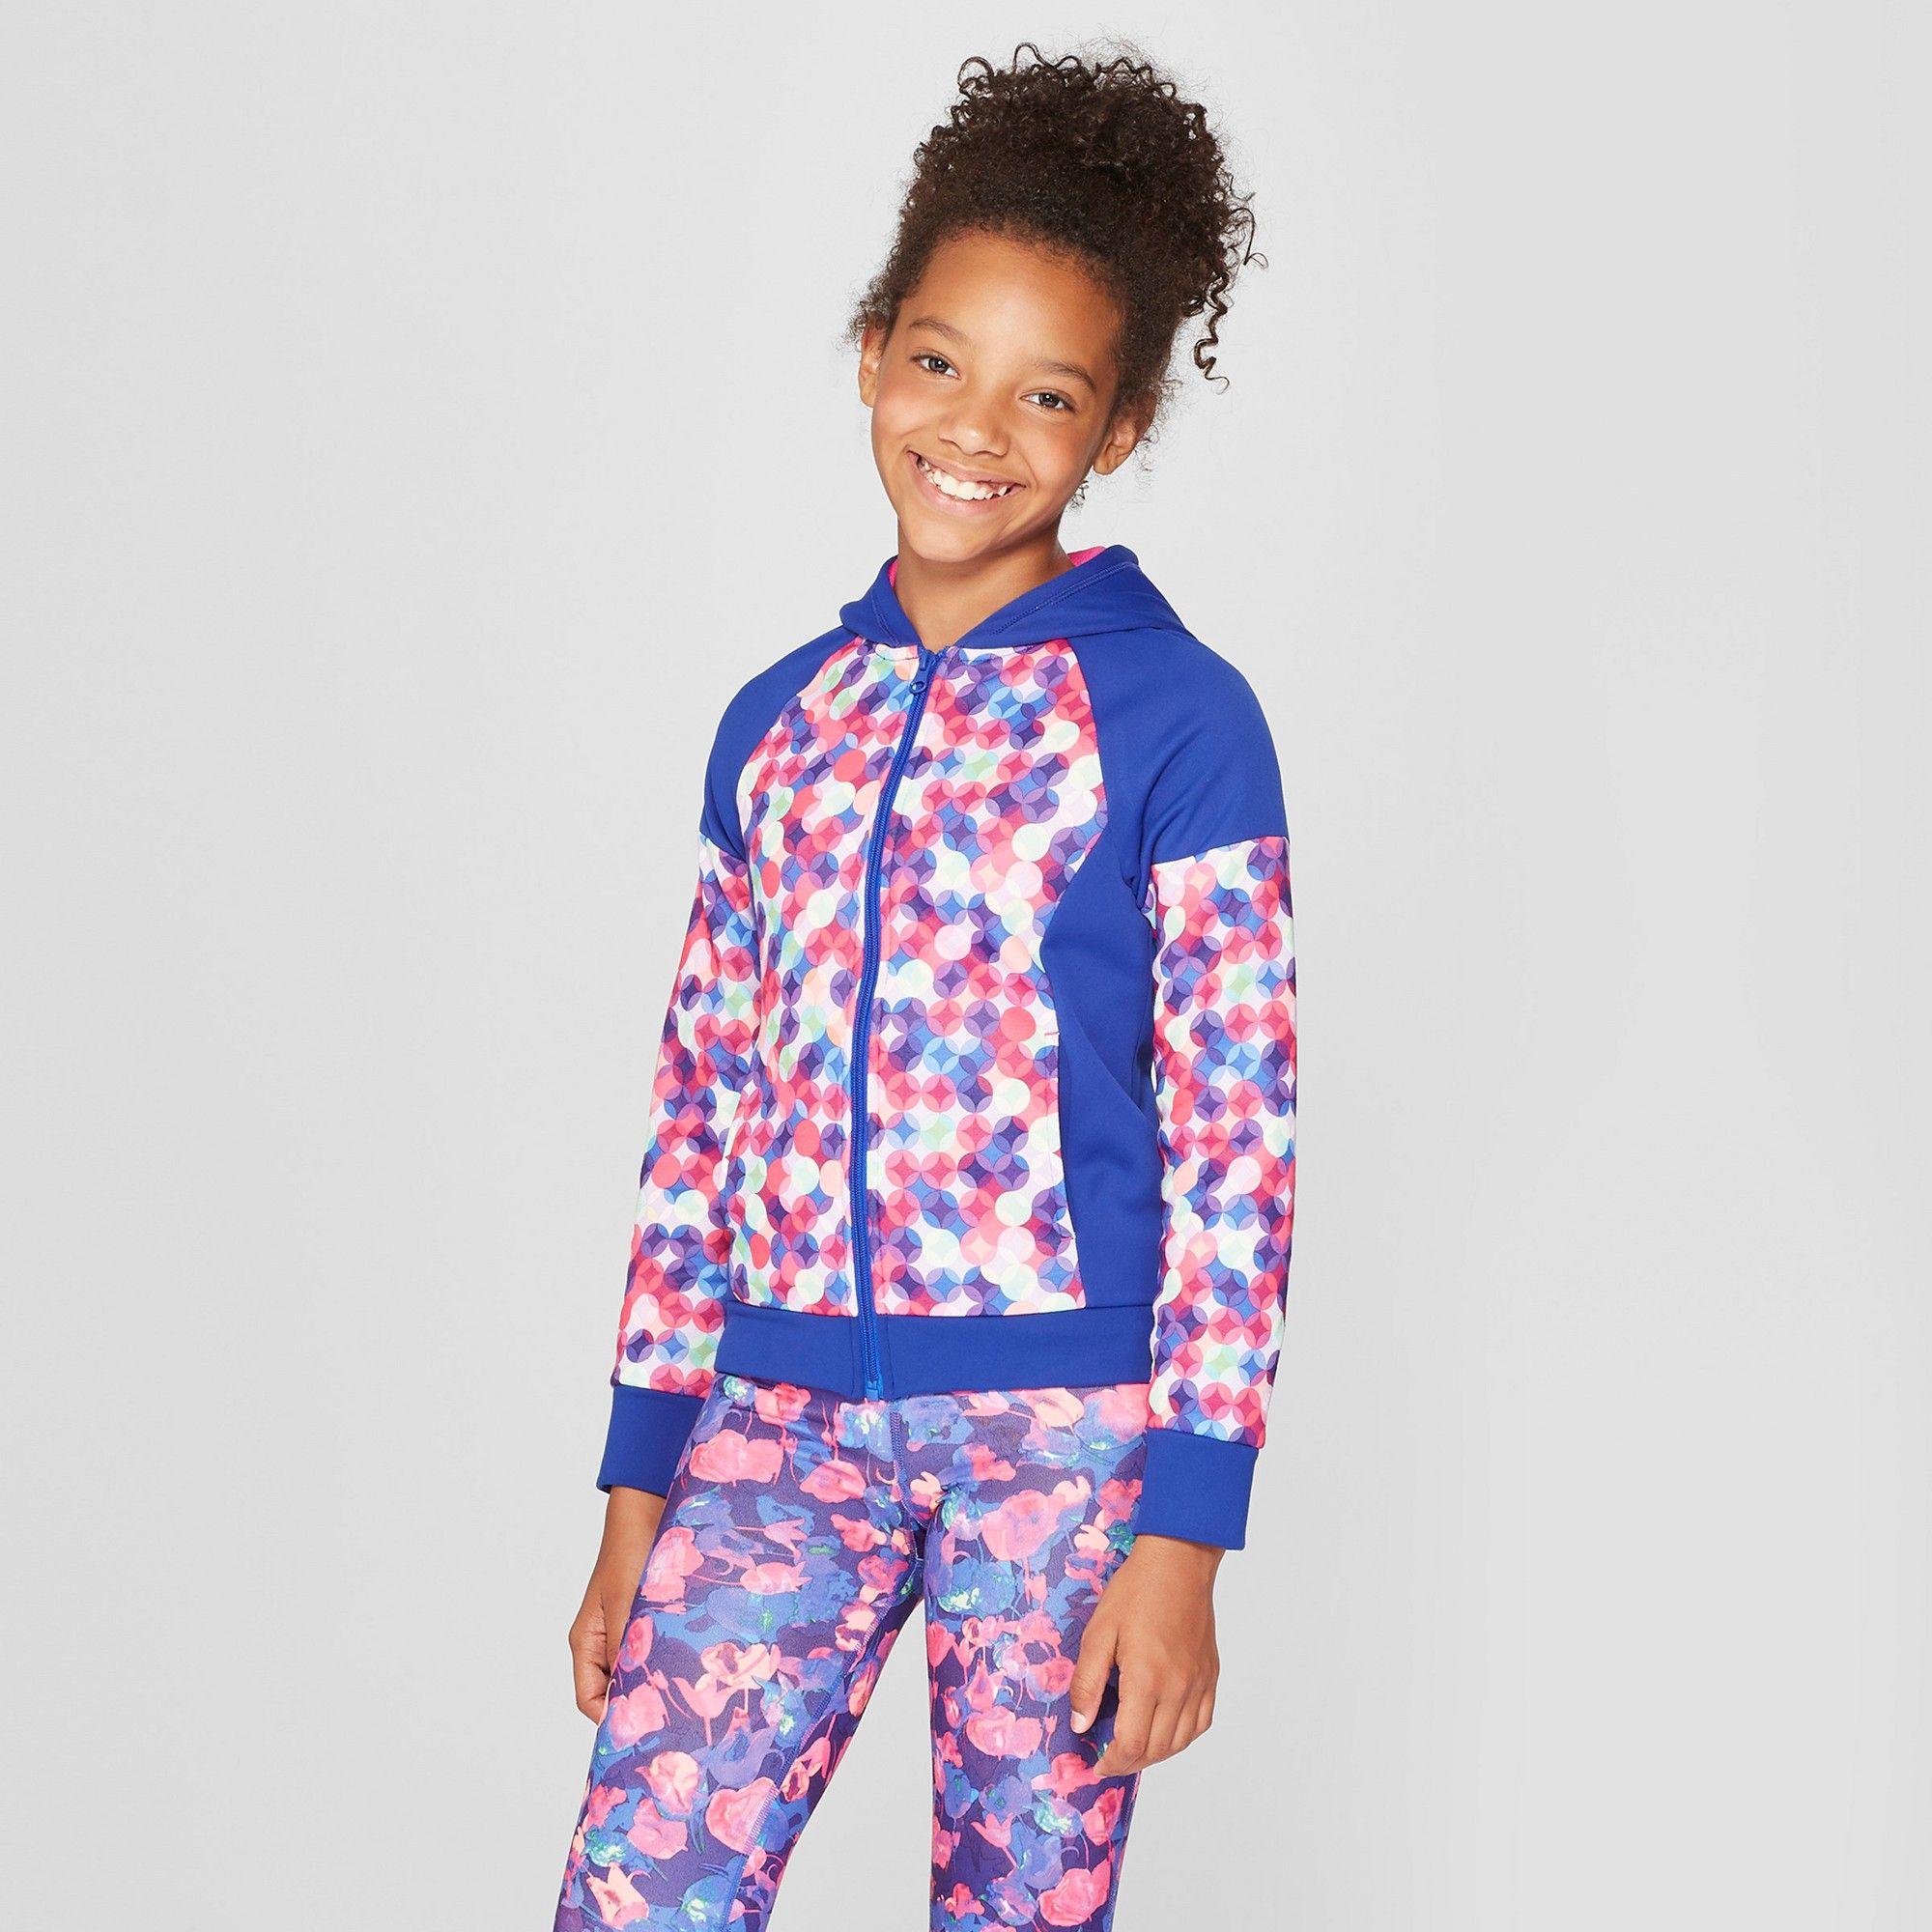 42acbe394 Girls' Printed Tech Fleece Full Zip Hoodie - C9 Champion Light Pink Tulips  Multi Print XL, Purple